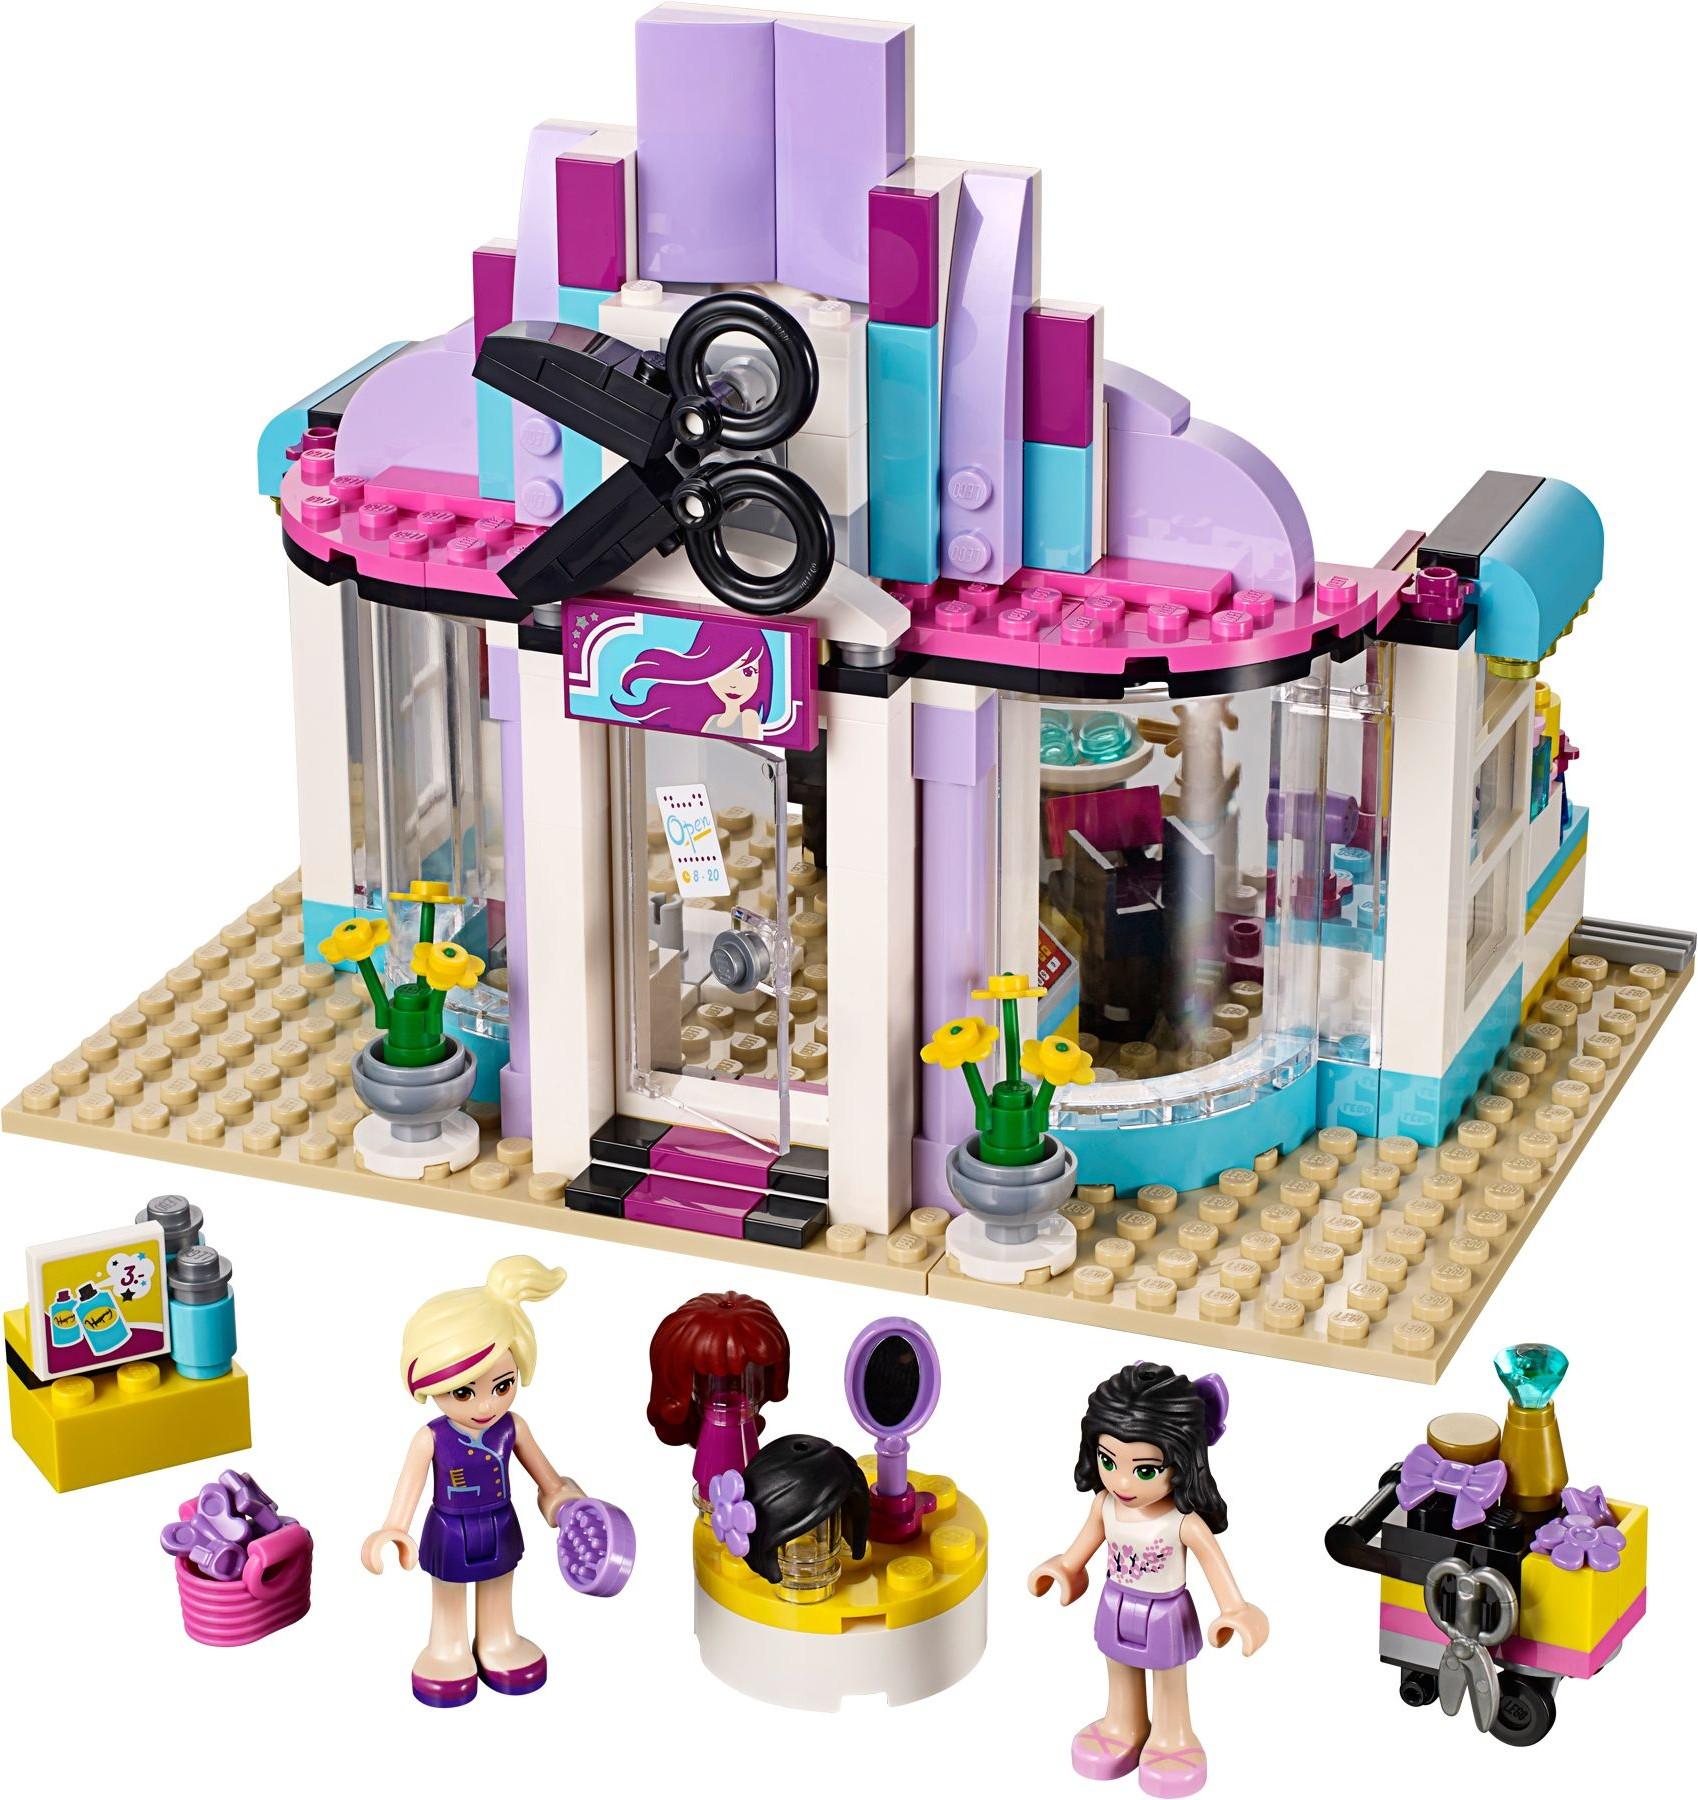 Friends 2015 Brickset Lego Set Guide And Database